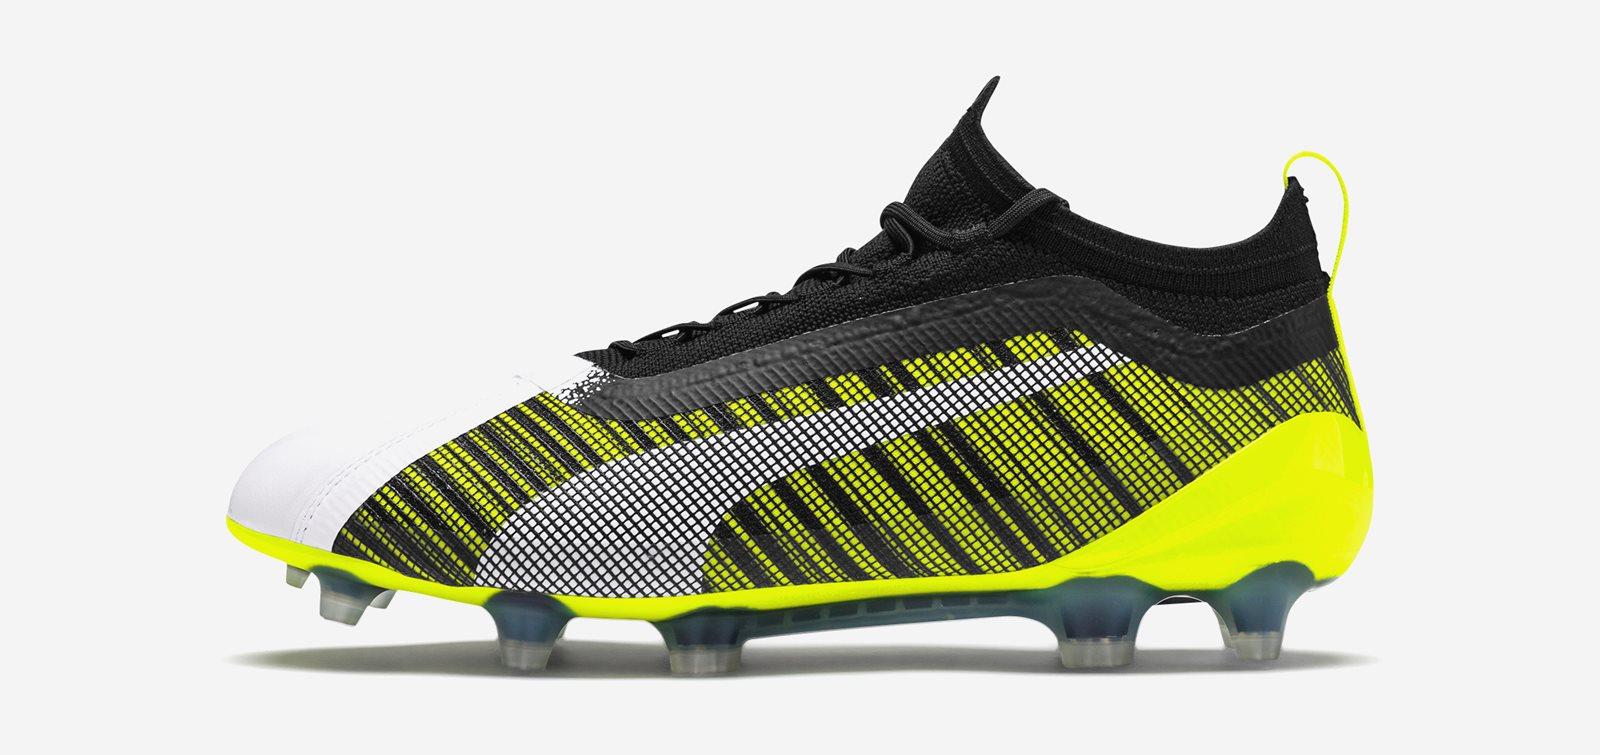 Puma ONE 5.1 evoKnit Football Boots